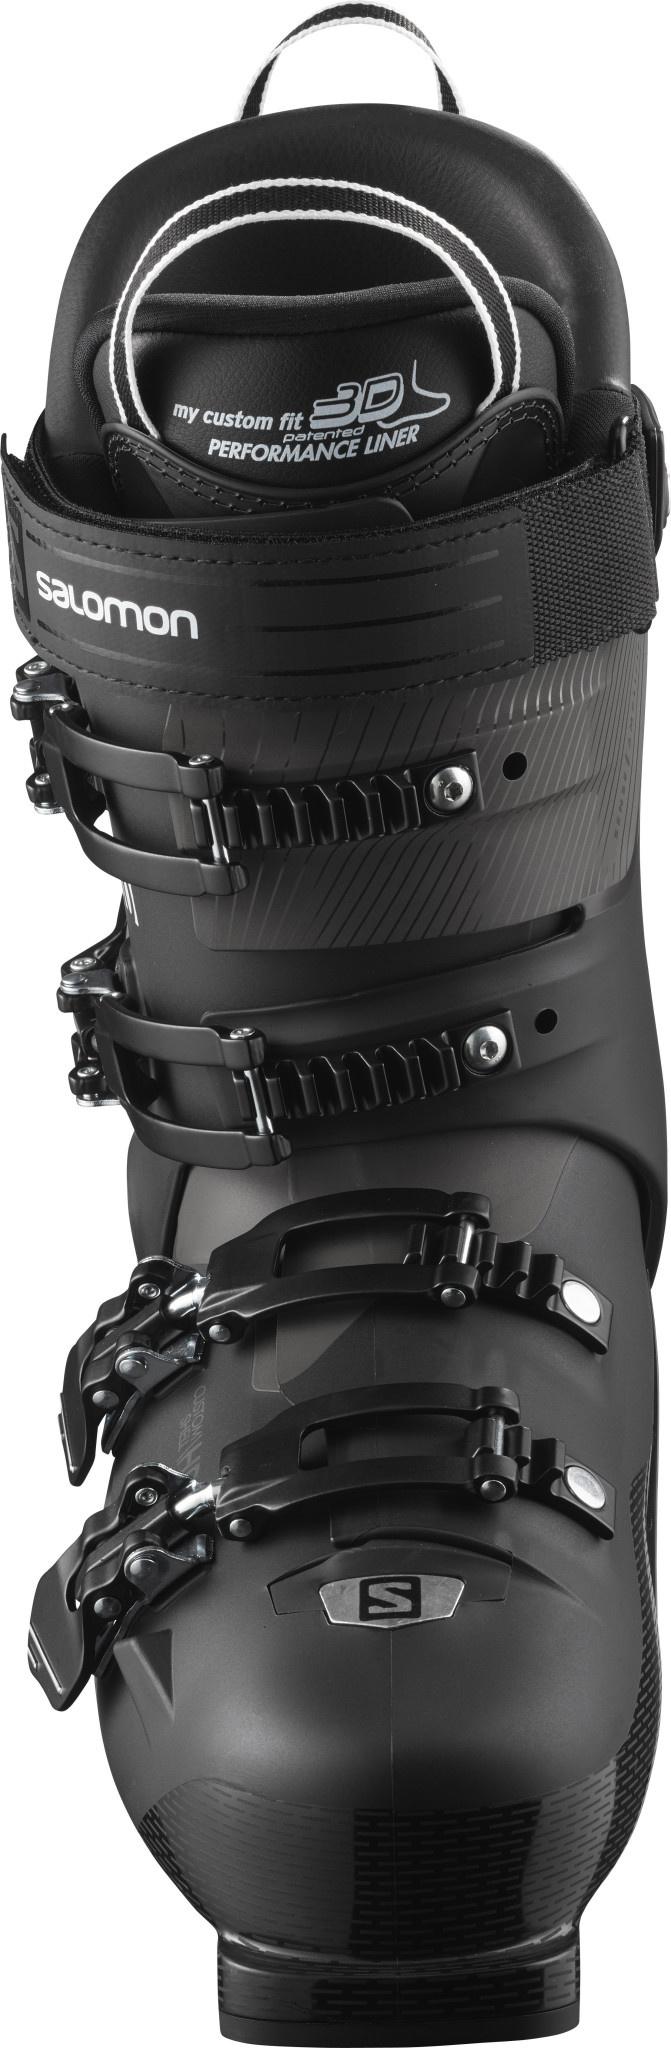 SALOMON Salomon Men's S/Pro HV 100 Ski Boot (2021)